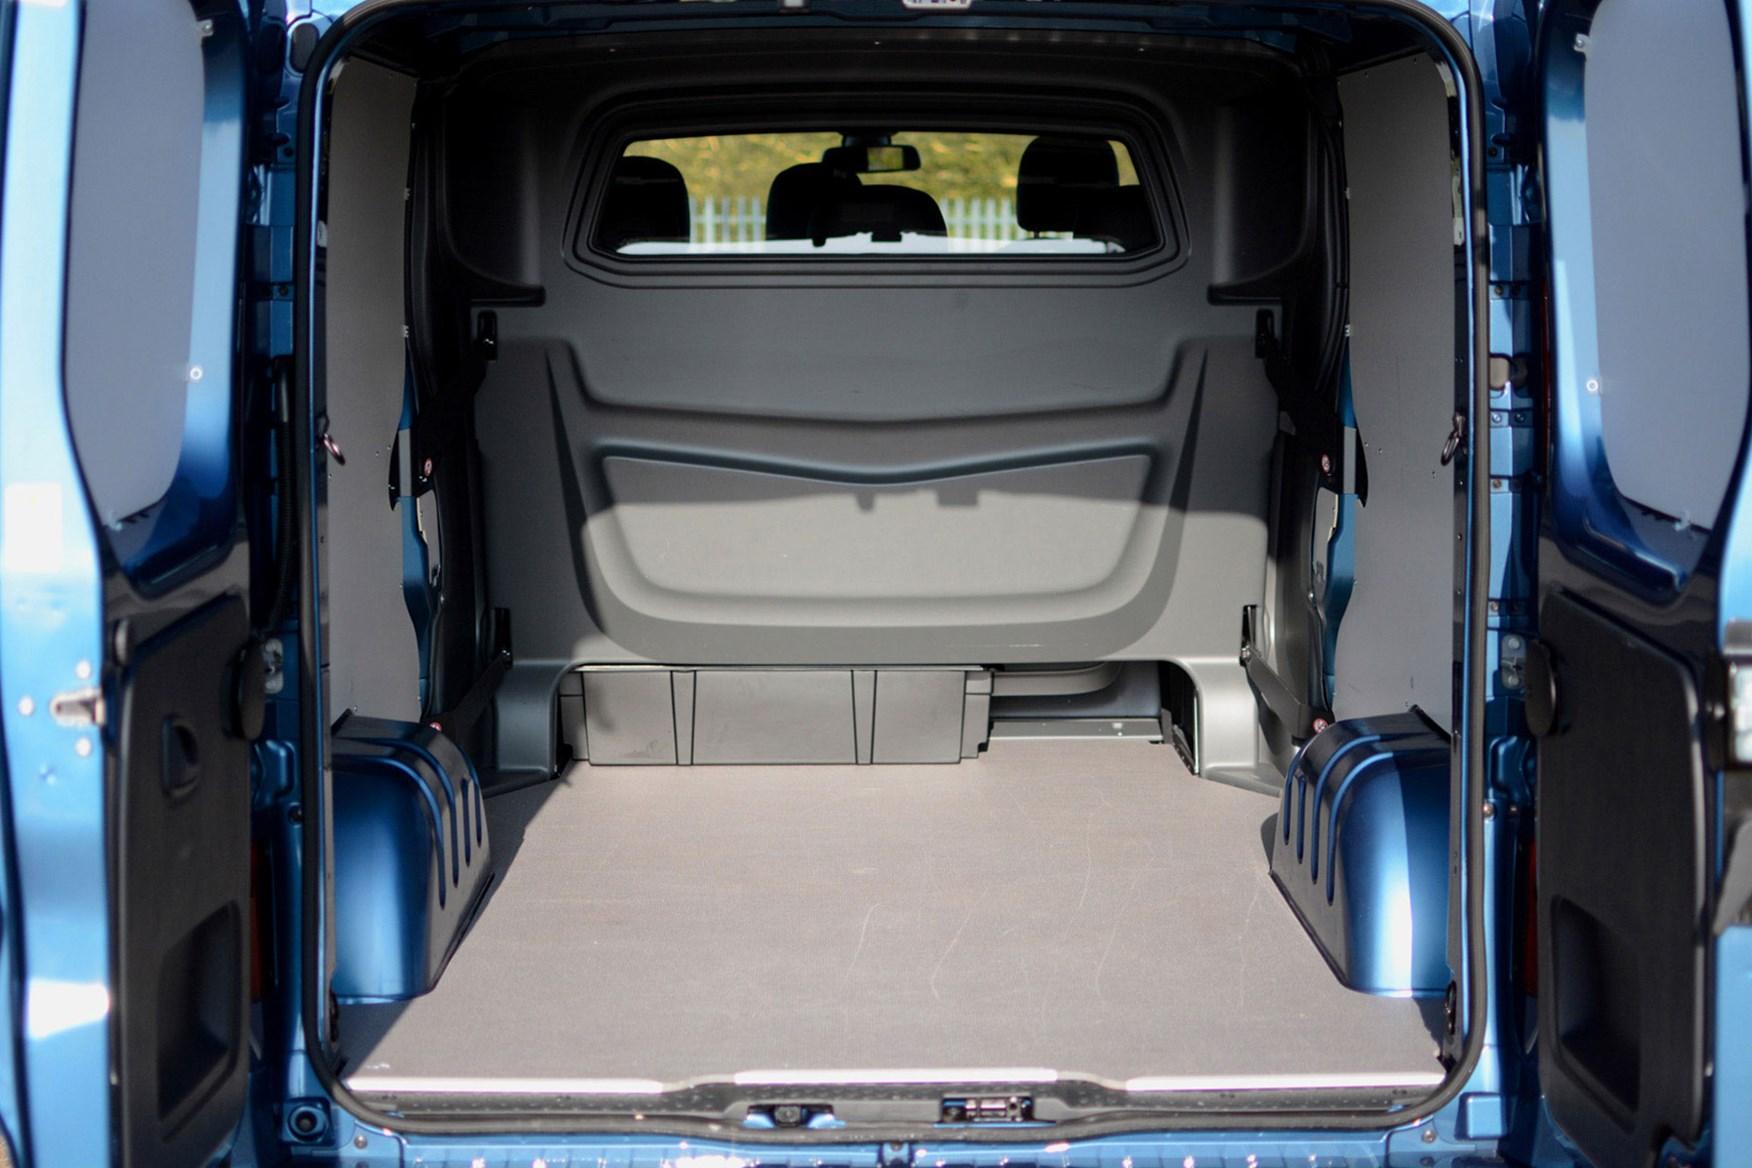 Vauxhall Vivaro Doublecab Sportive review - load area